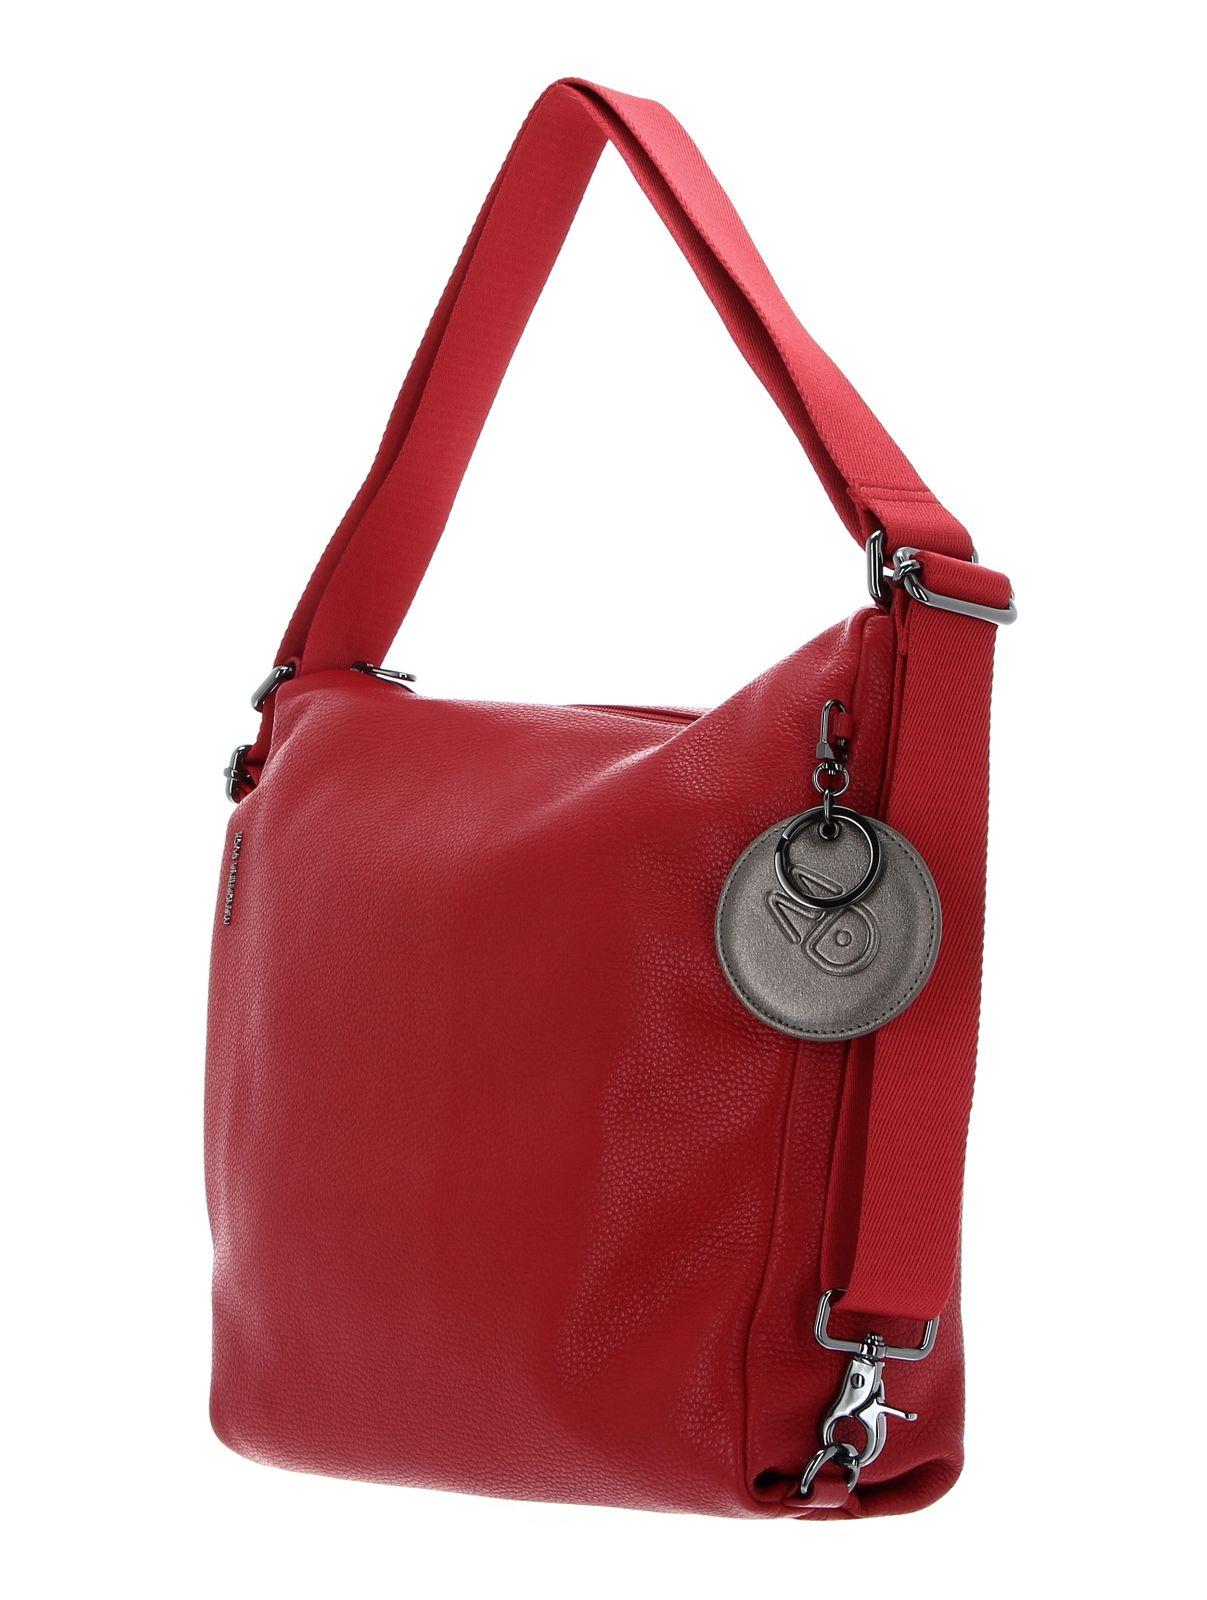 MANDARINA DUCK Mellow Leather Shoulderbag Flame Scarlet